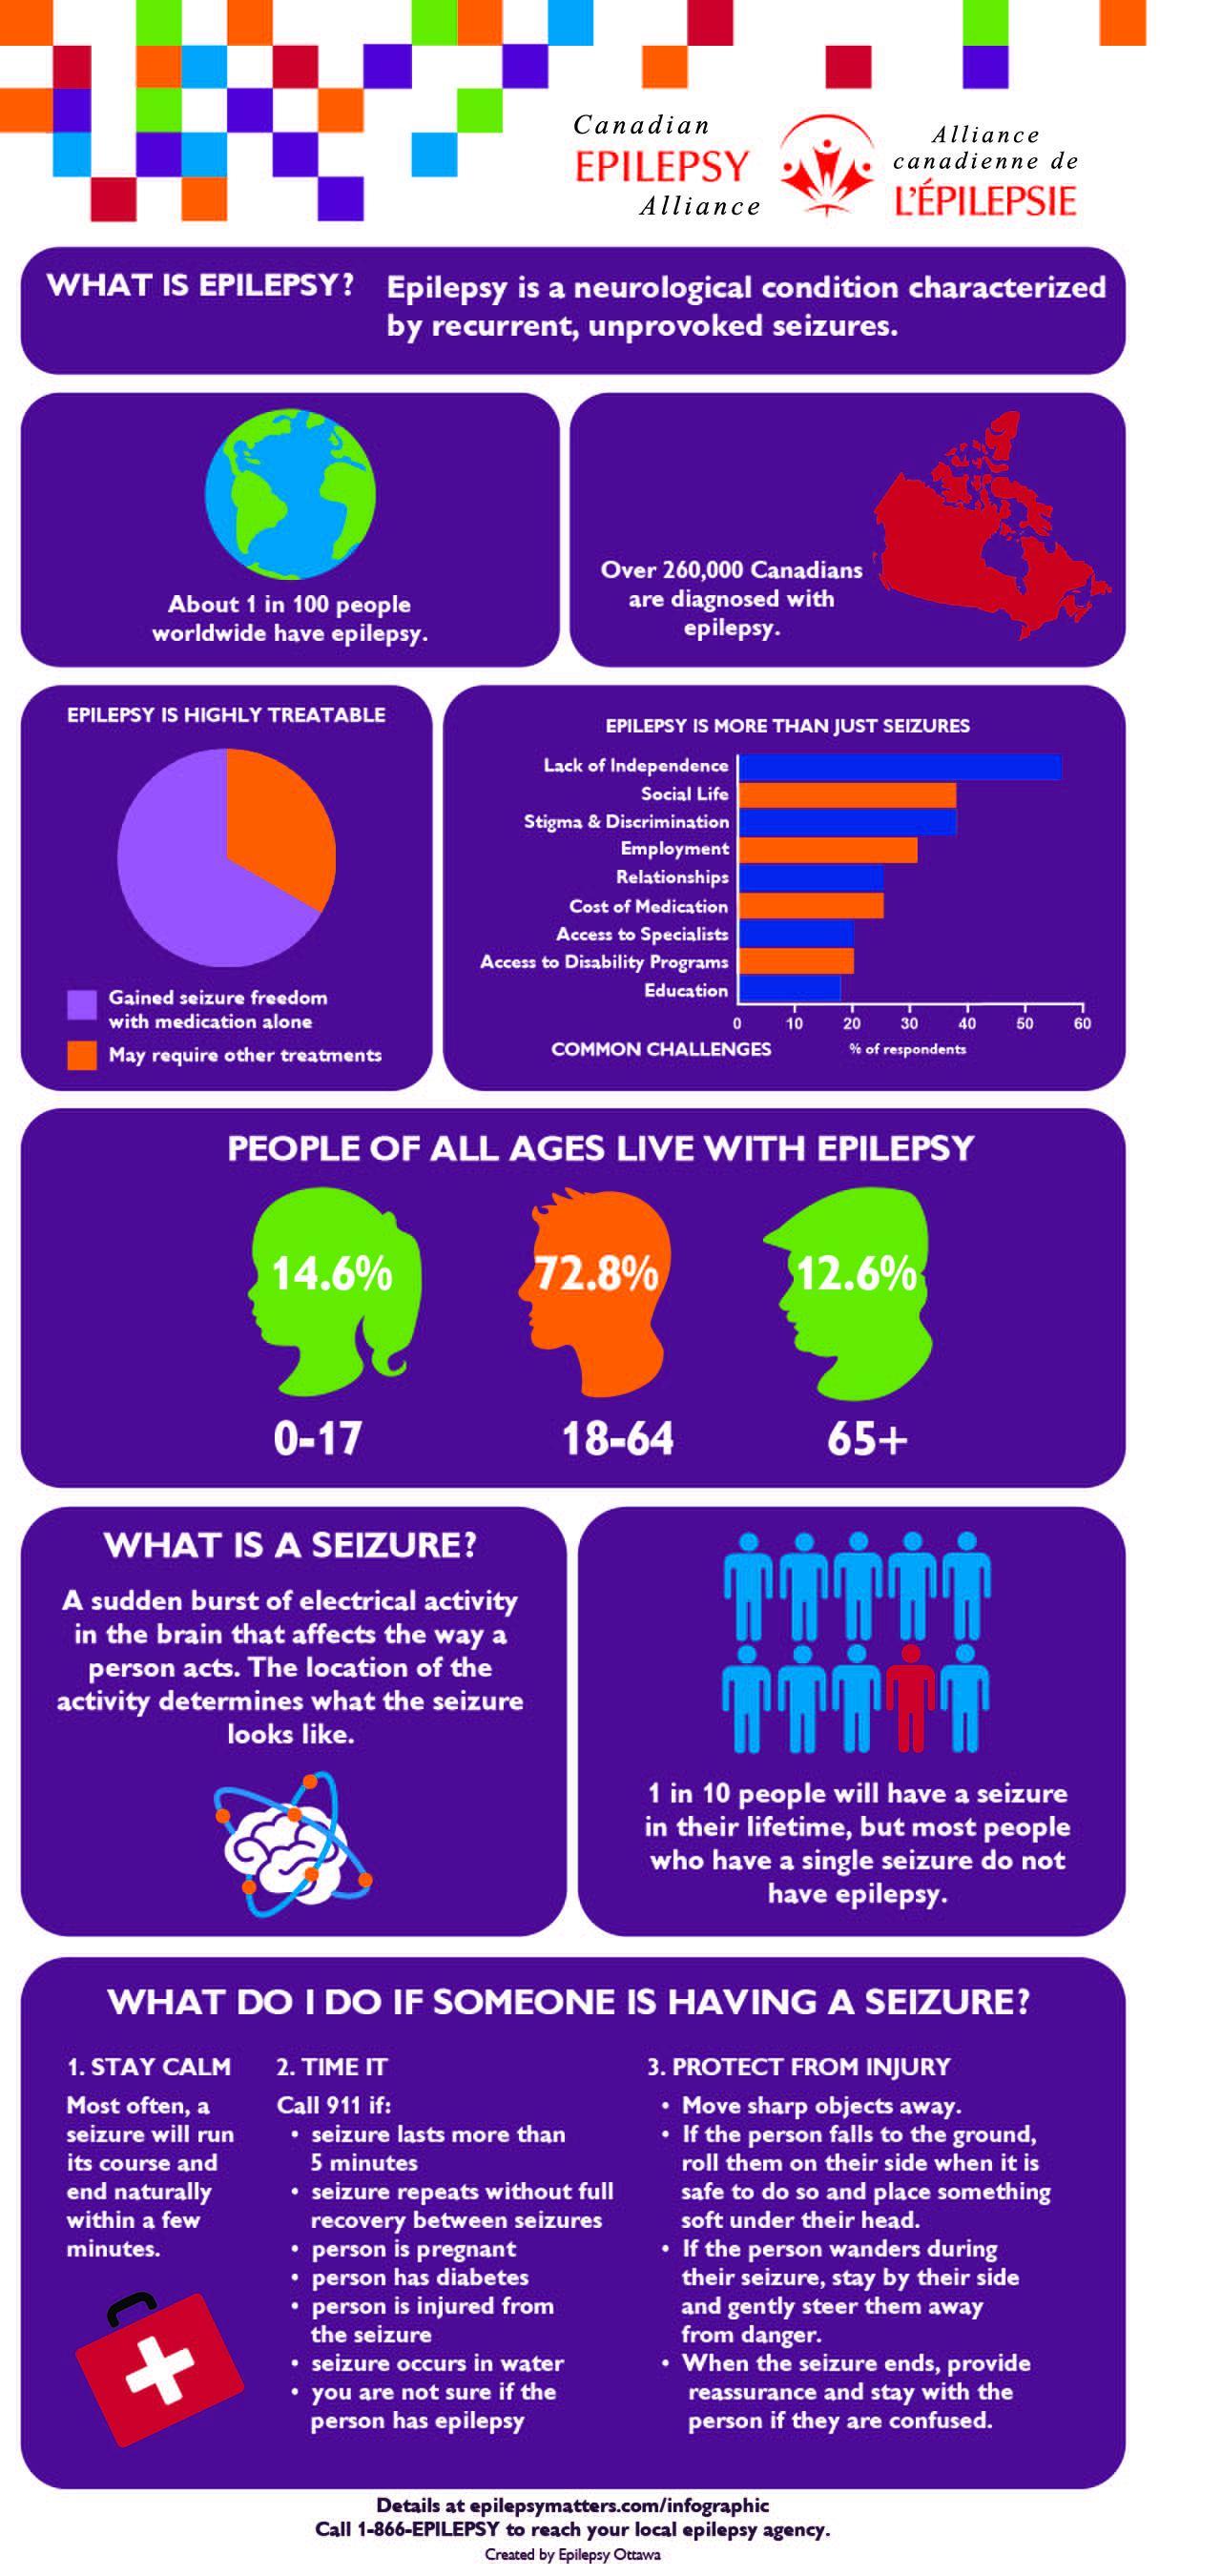 CEA Epilepsy Infographic English